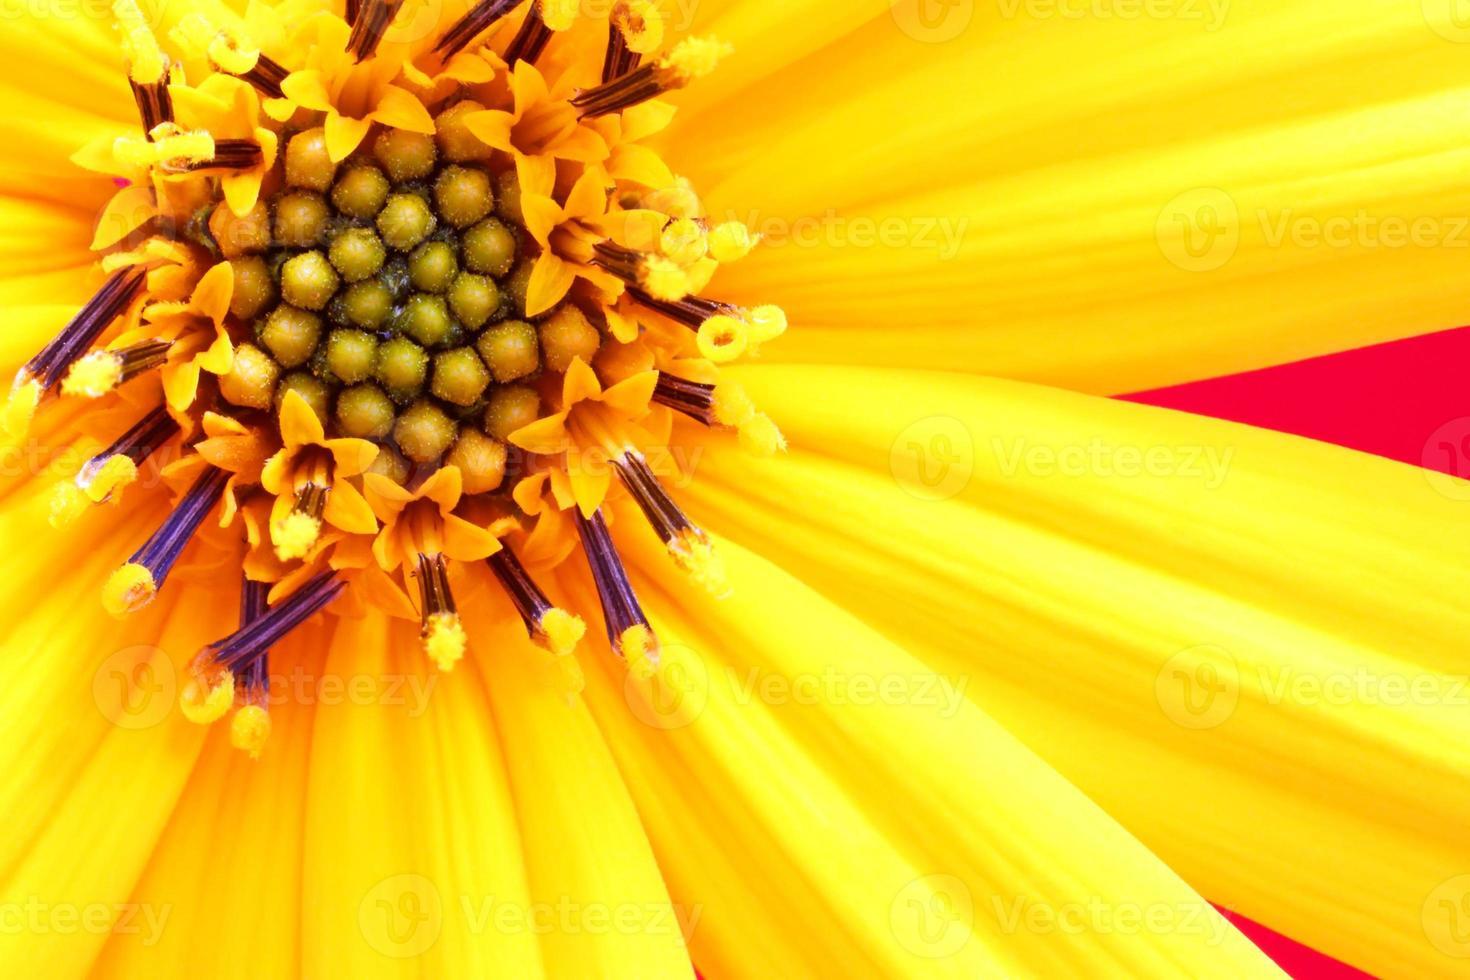 Girasol flower close up photo